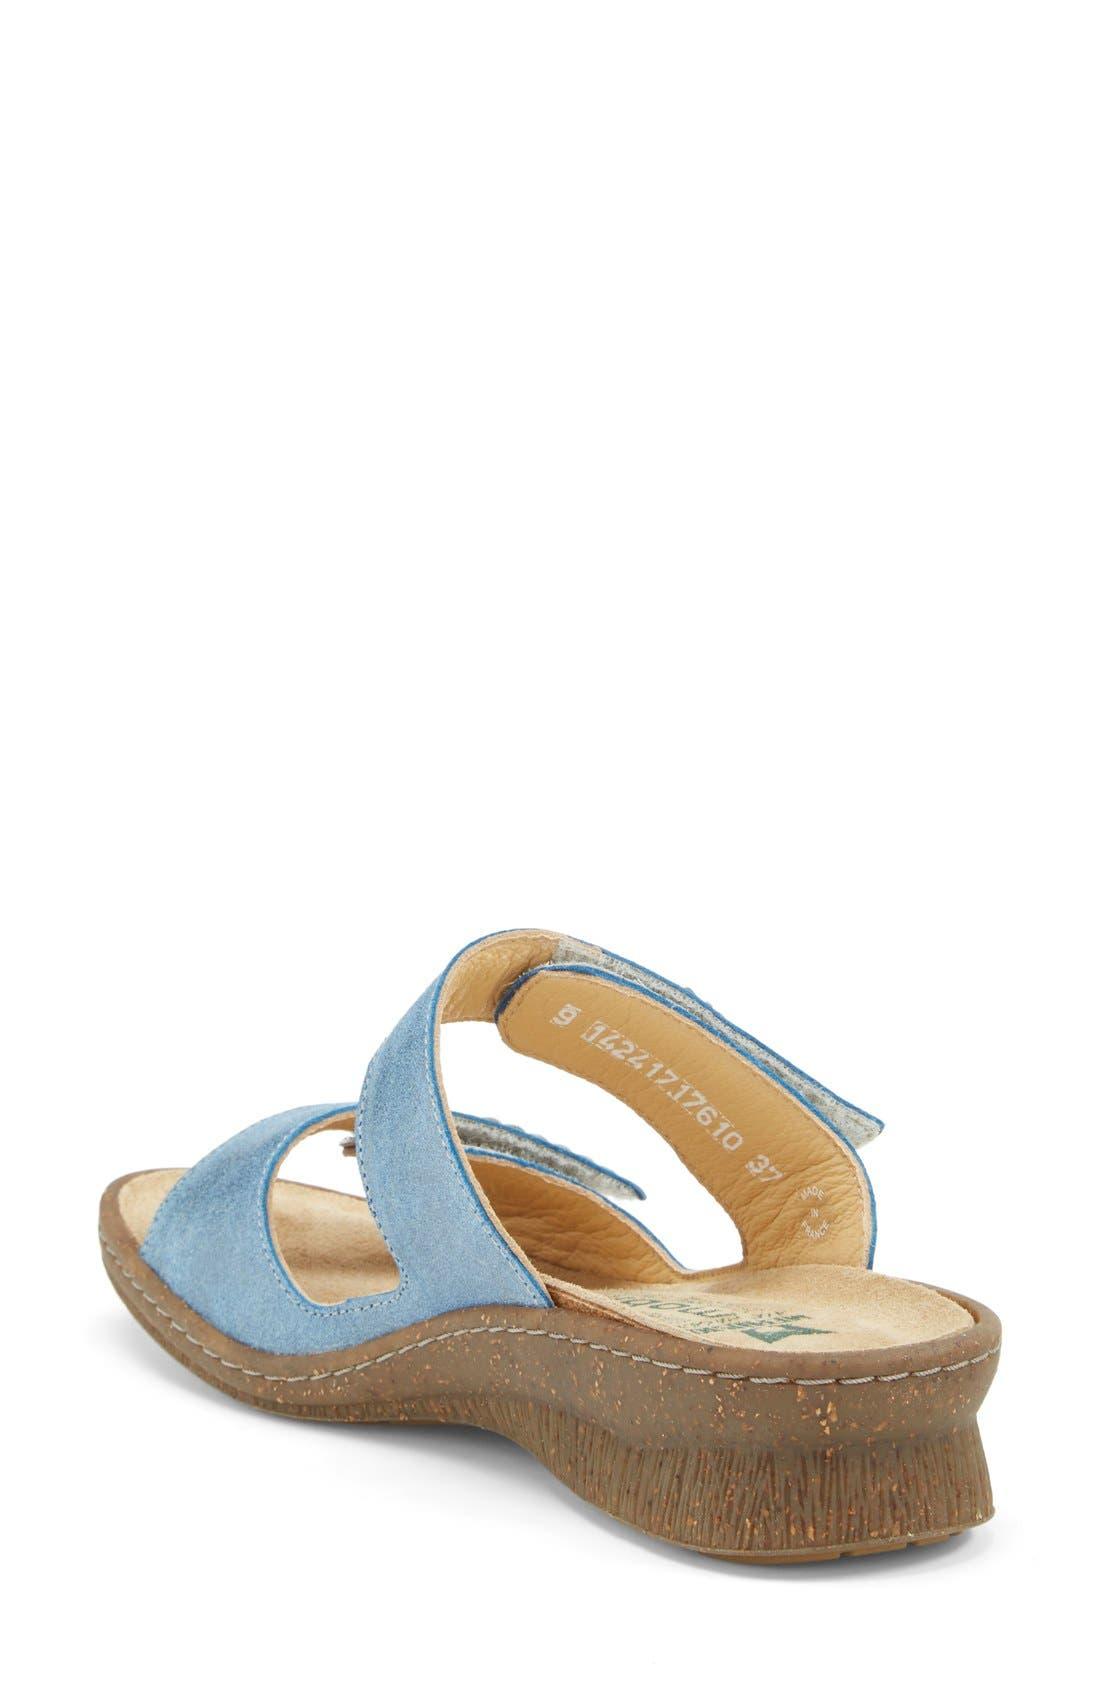 'Bregalia' Metallic Leather Sandal,                             Alternate thumbnail 6, color,                             400